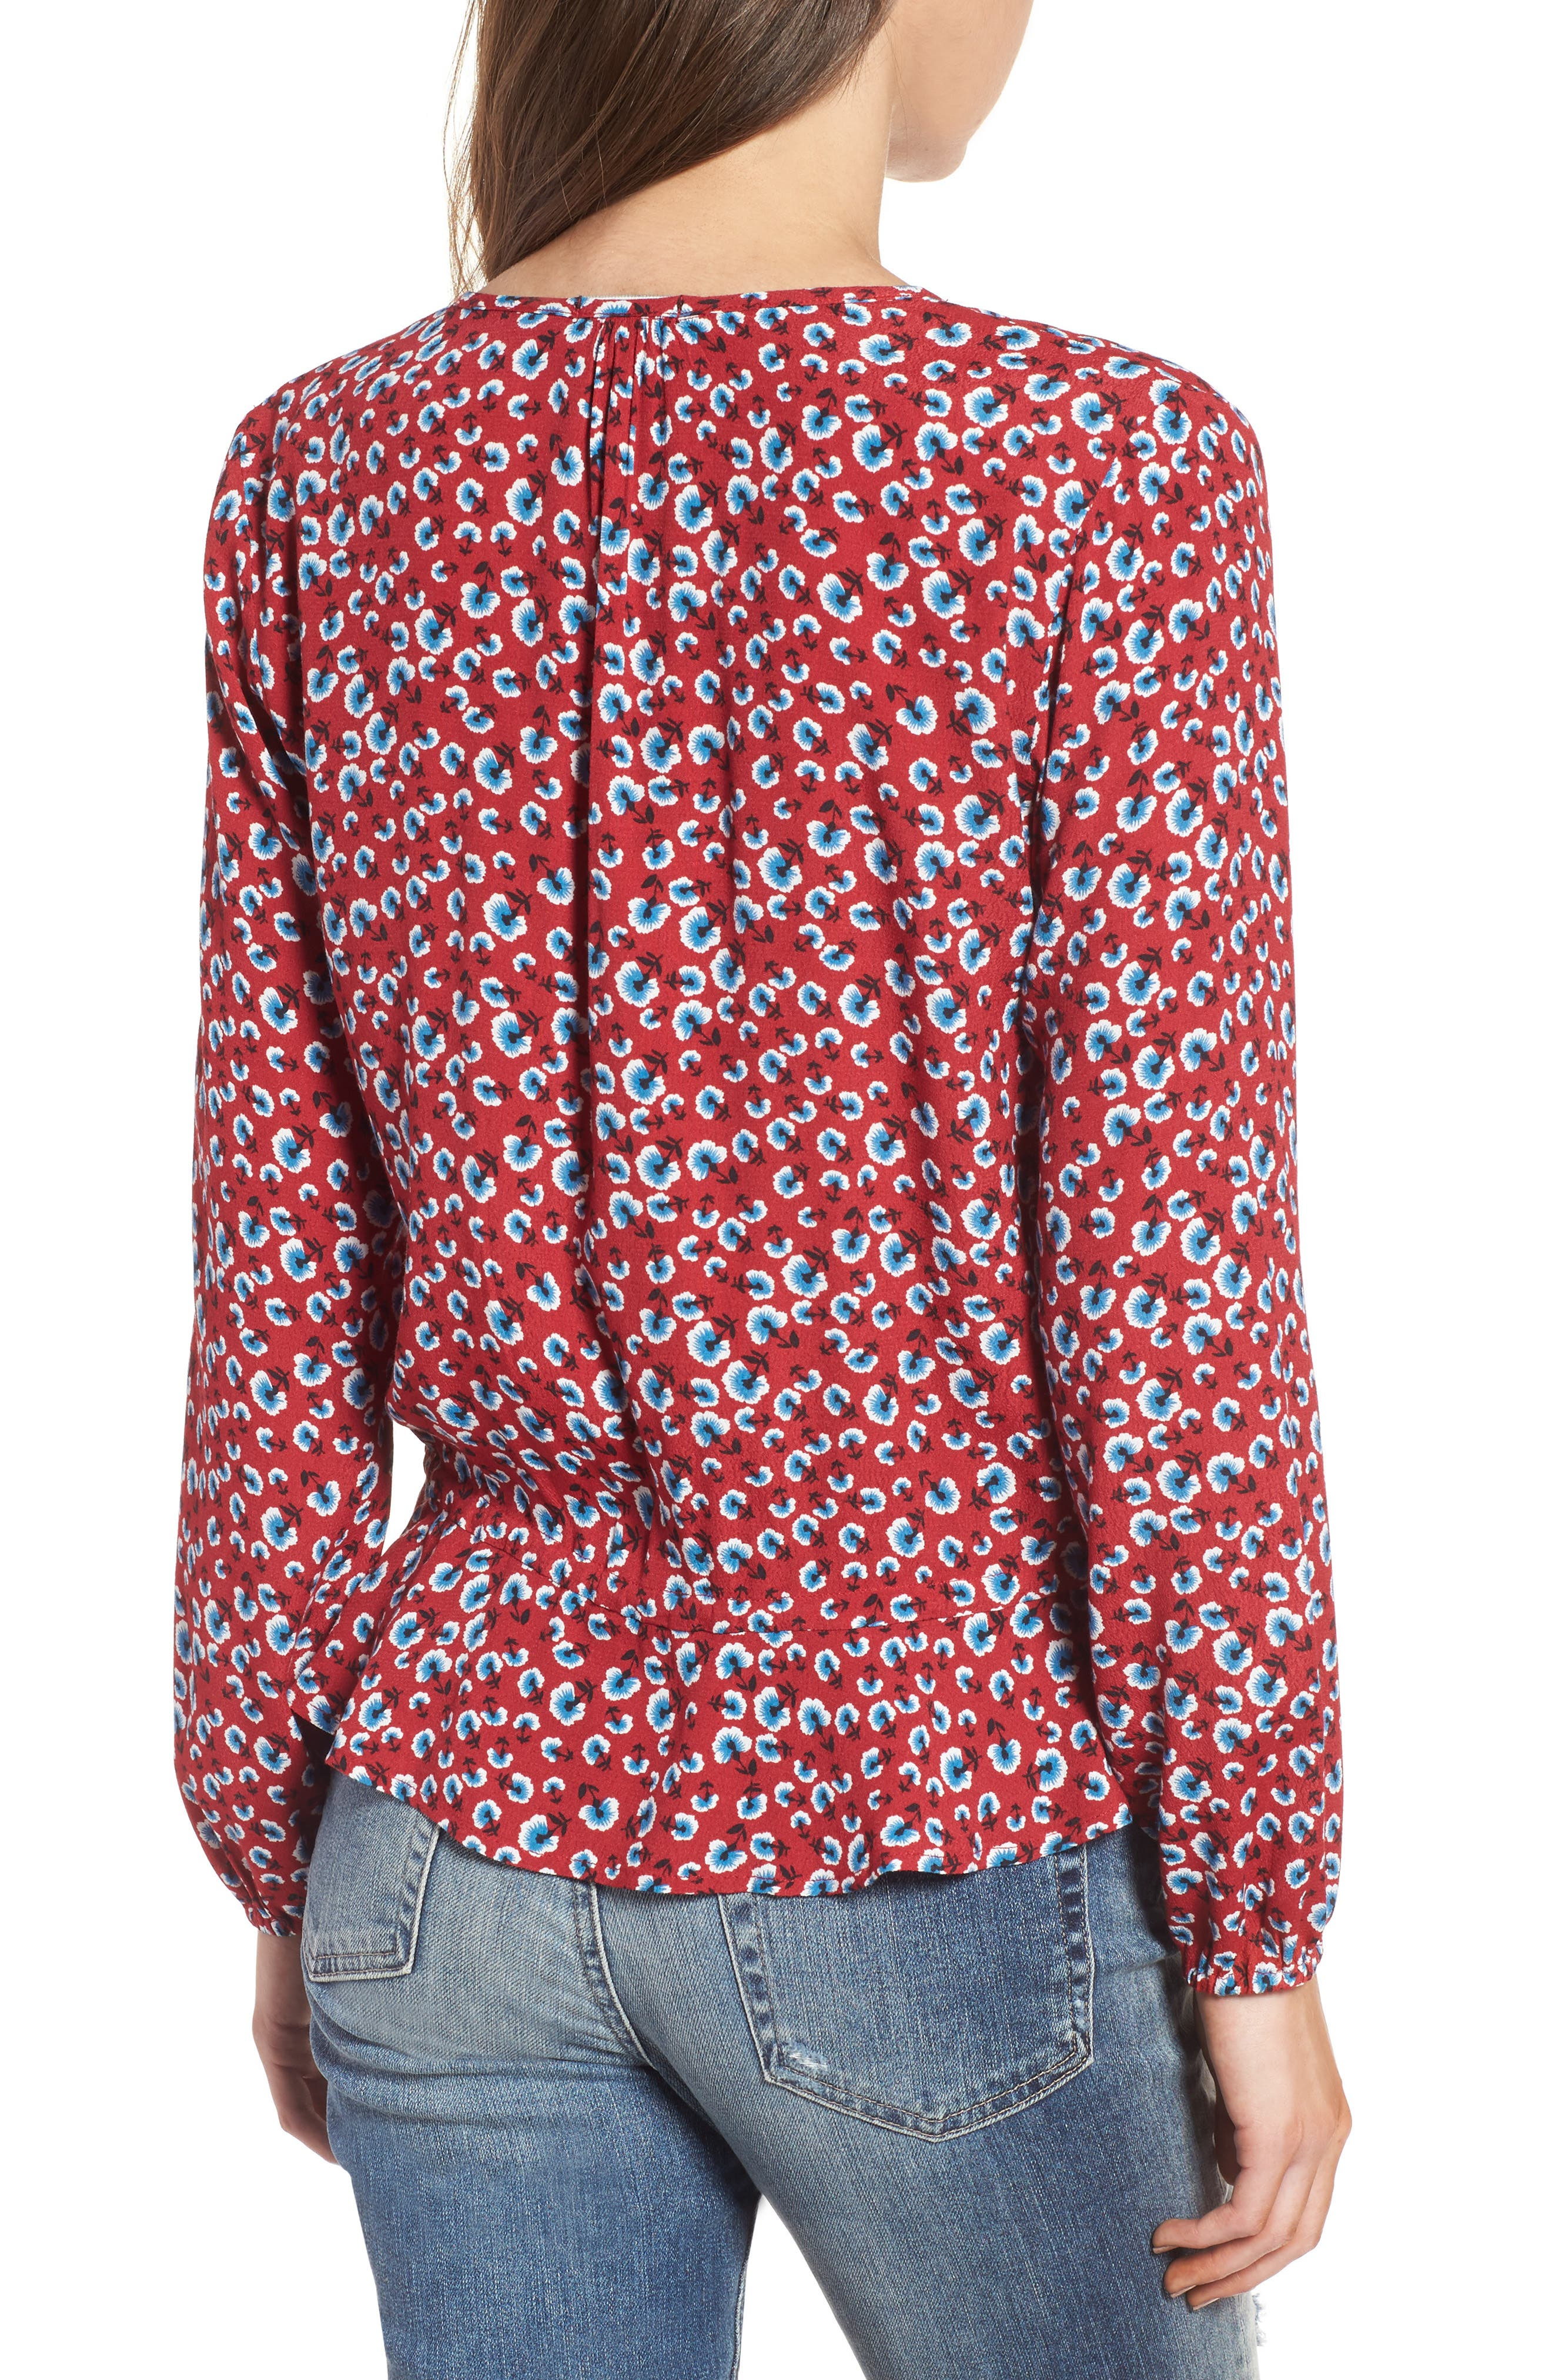 Beaux Print Blouse,                             Alternate thumbnail 2, color,                             Red Floral